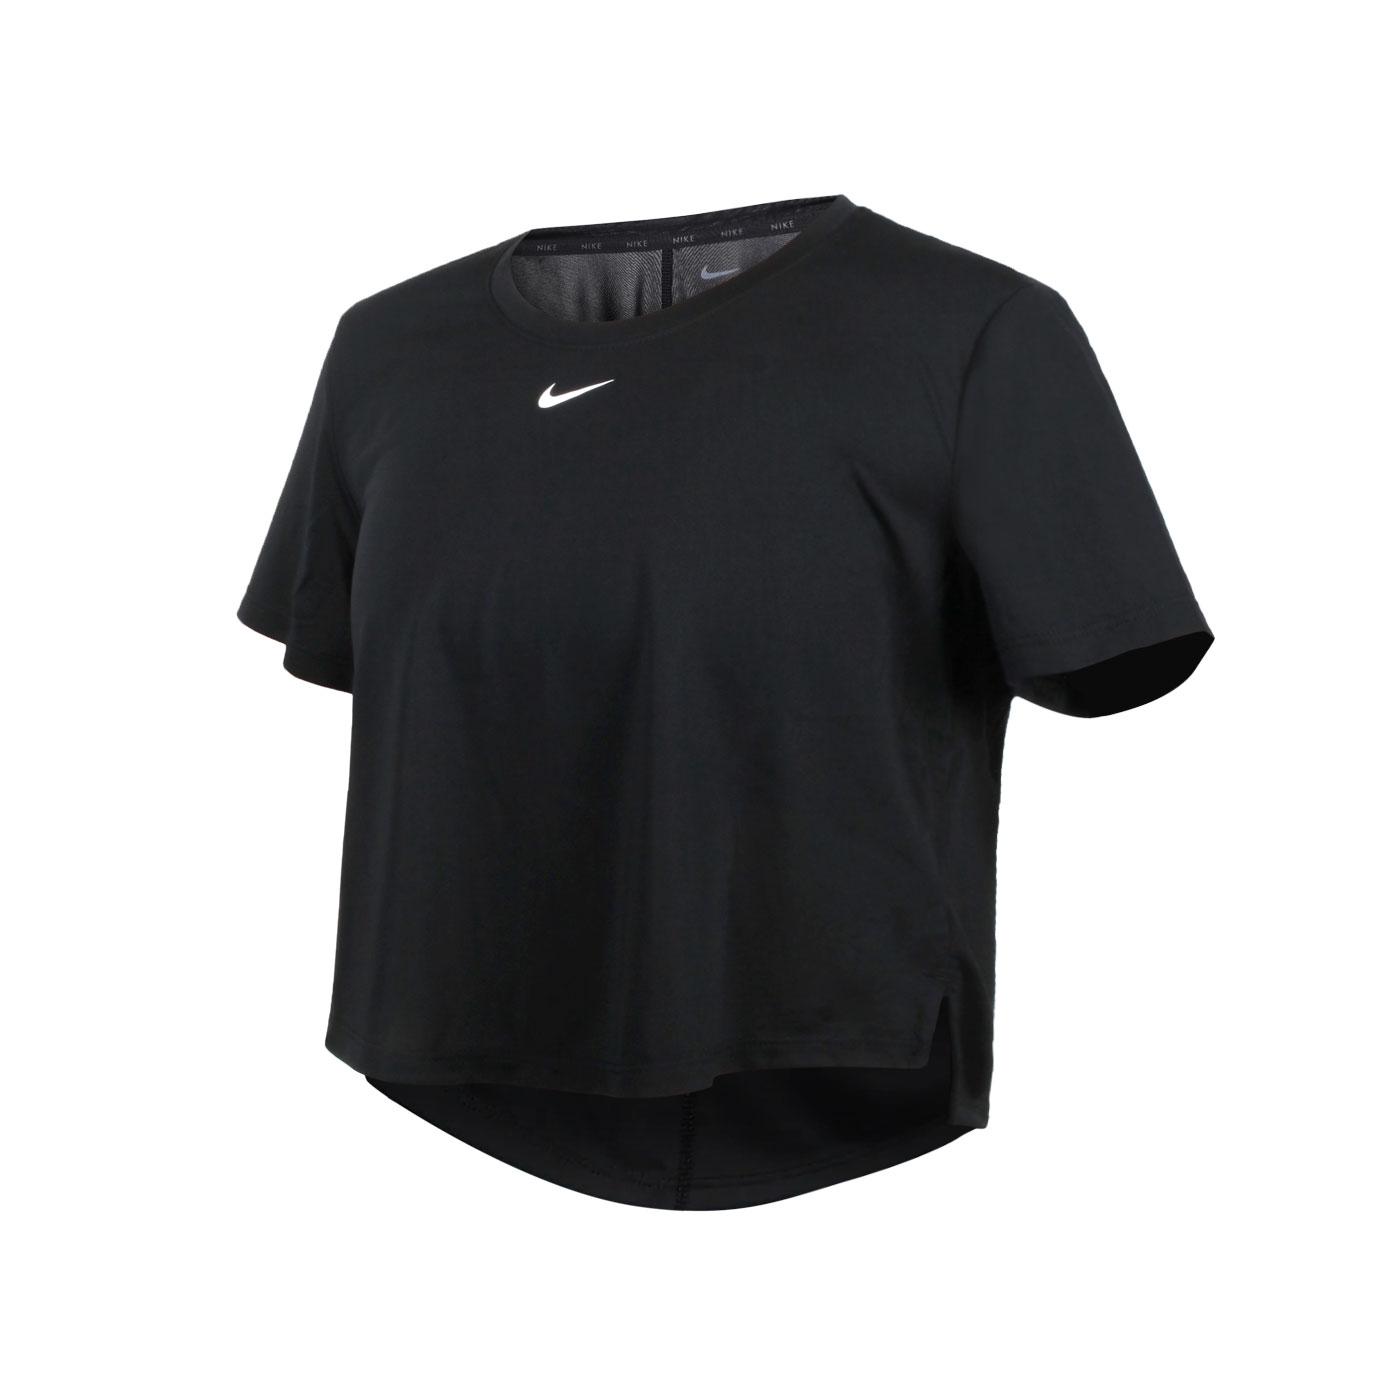 NIKE 女款短版短袖T恤 DD4955-010 - 黑白